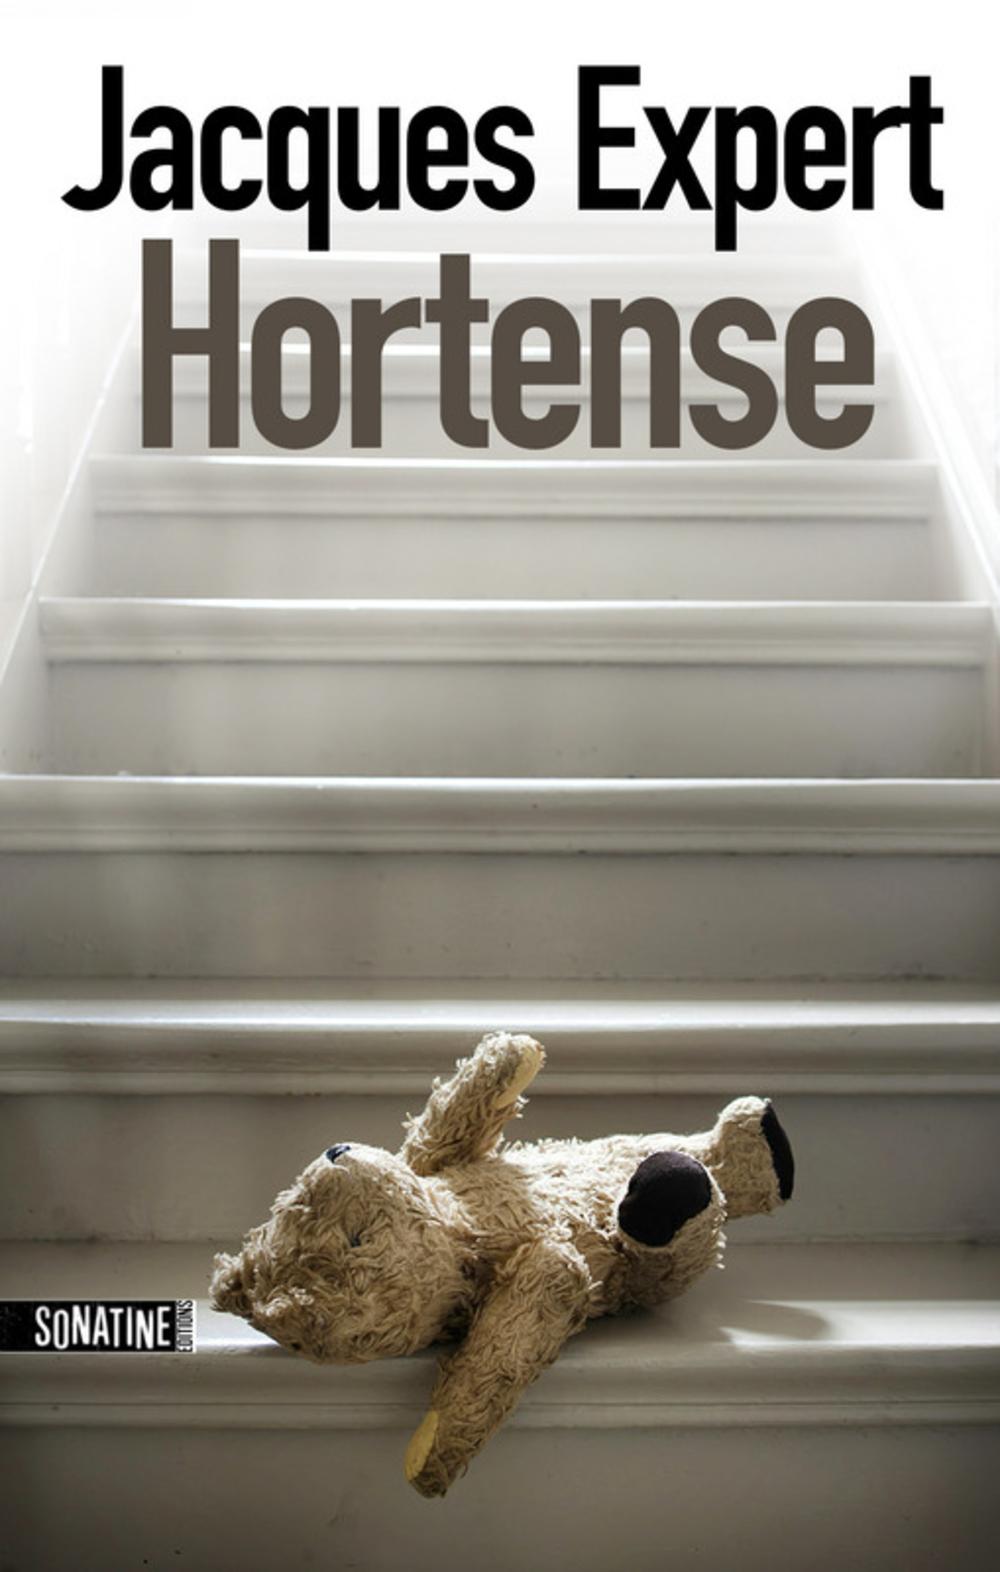 Hortense | EXPERT, Jacques